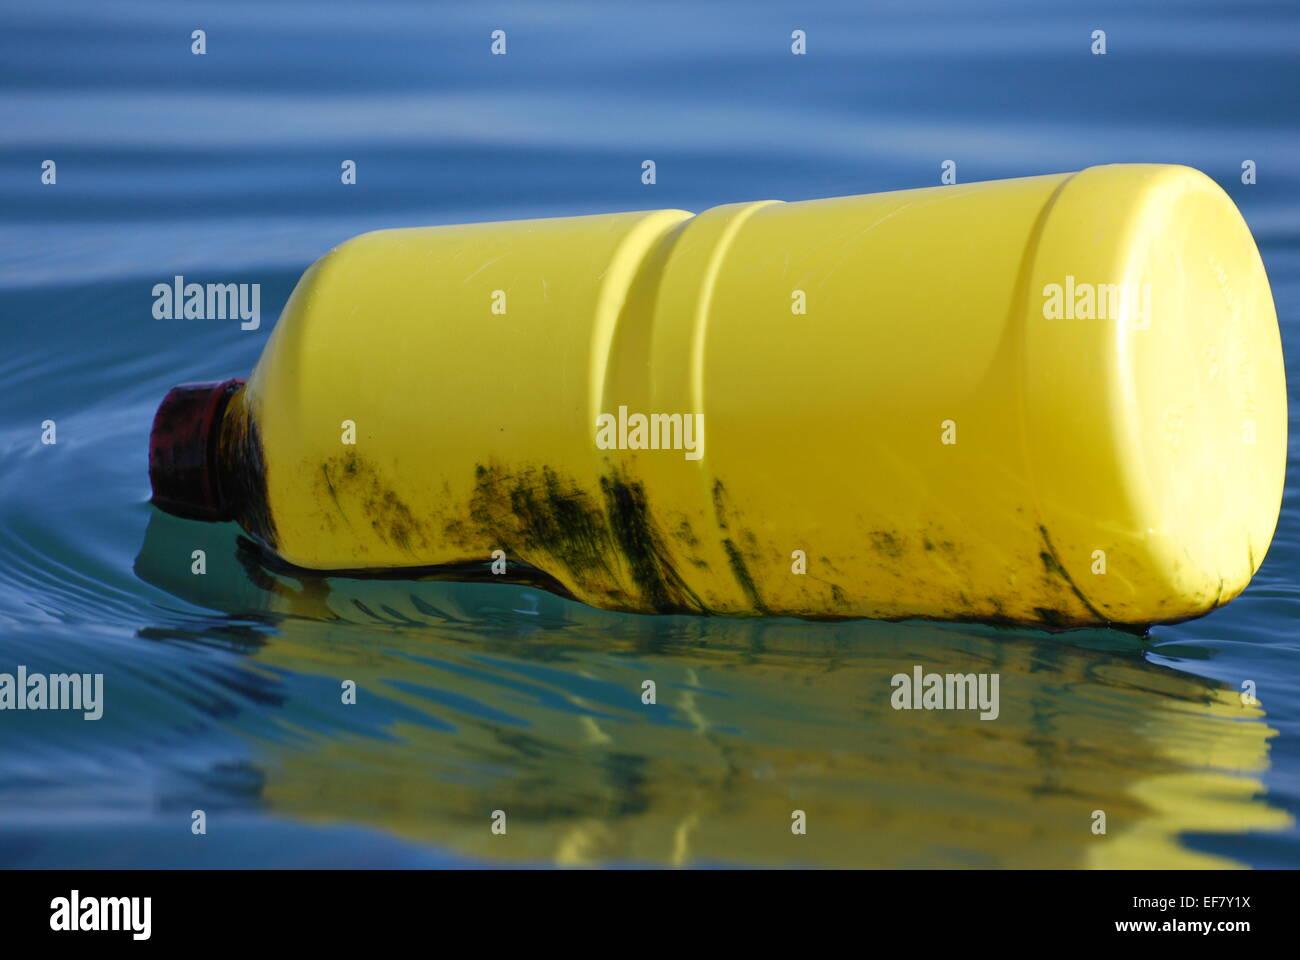 Plastic bottle floating on the sea in Dorset, UK Stock Photo